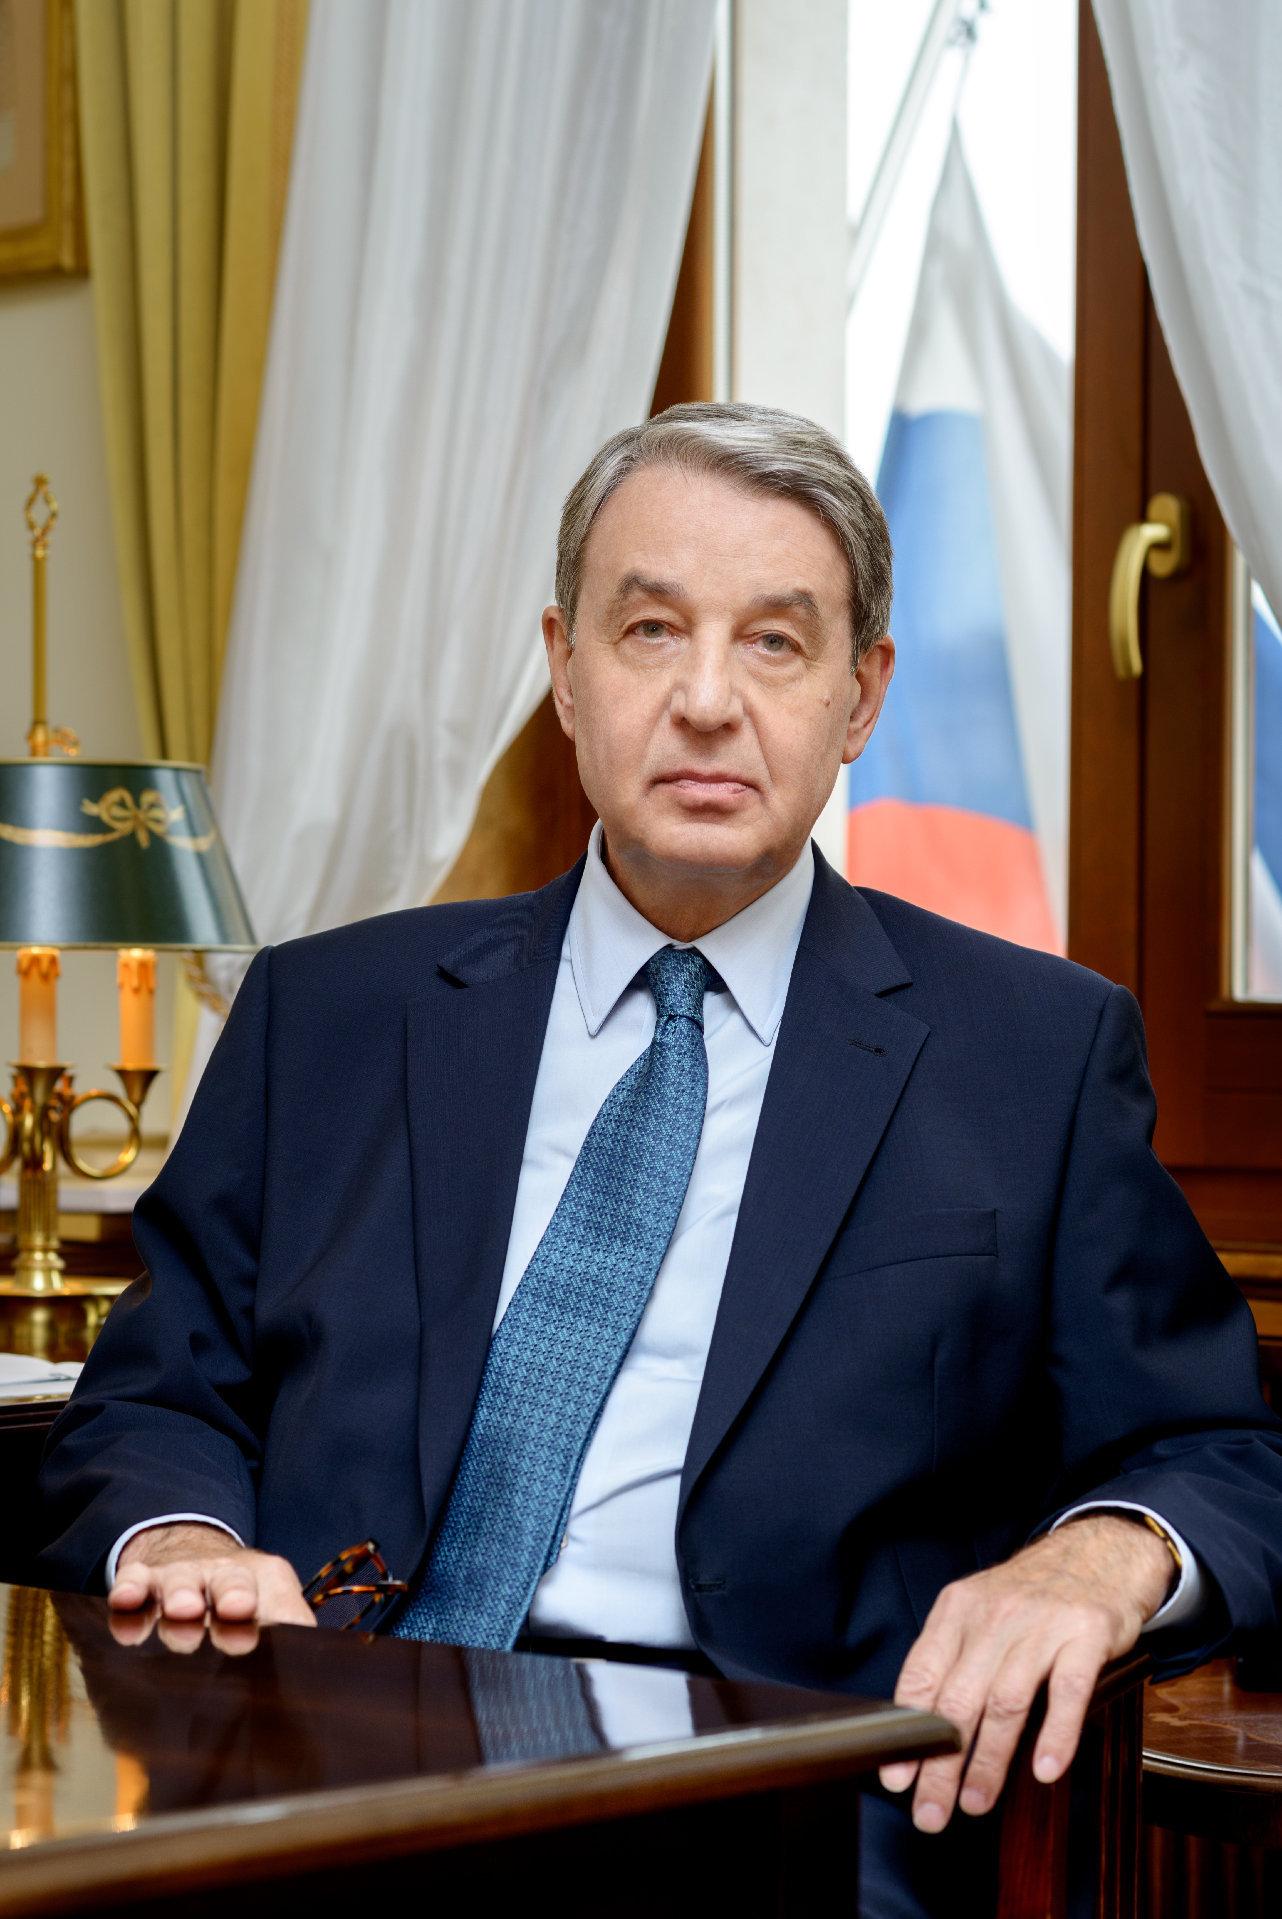 L'ambasciatore russo in Vaticano Aleksandr Avdeev